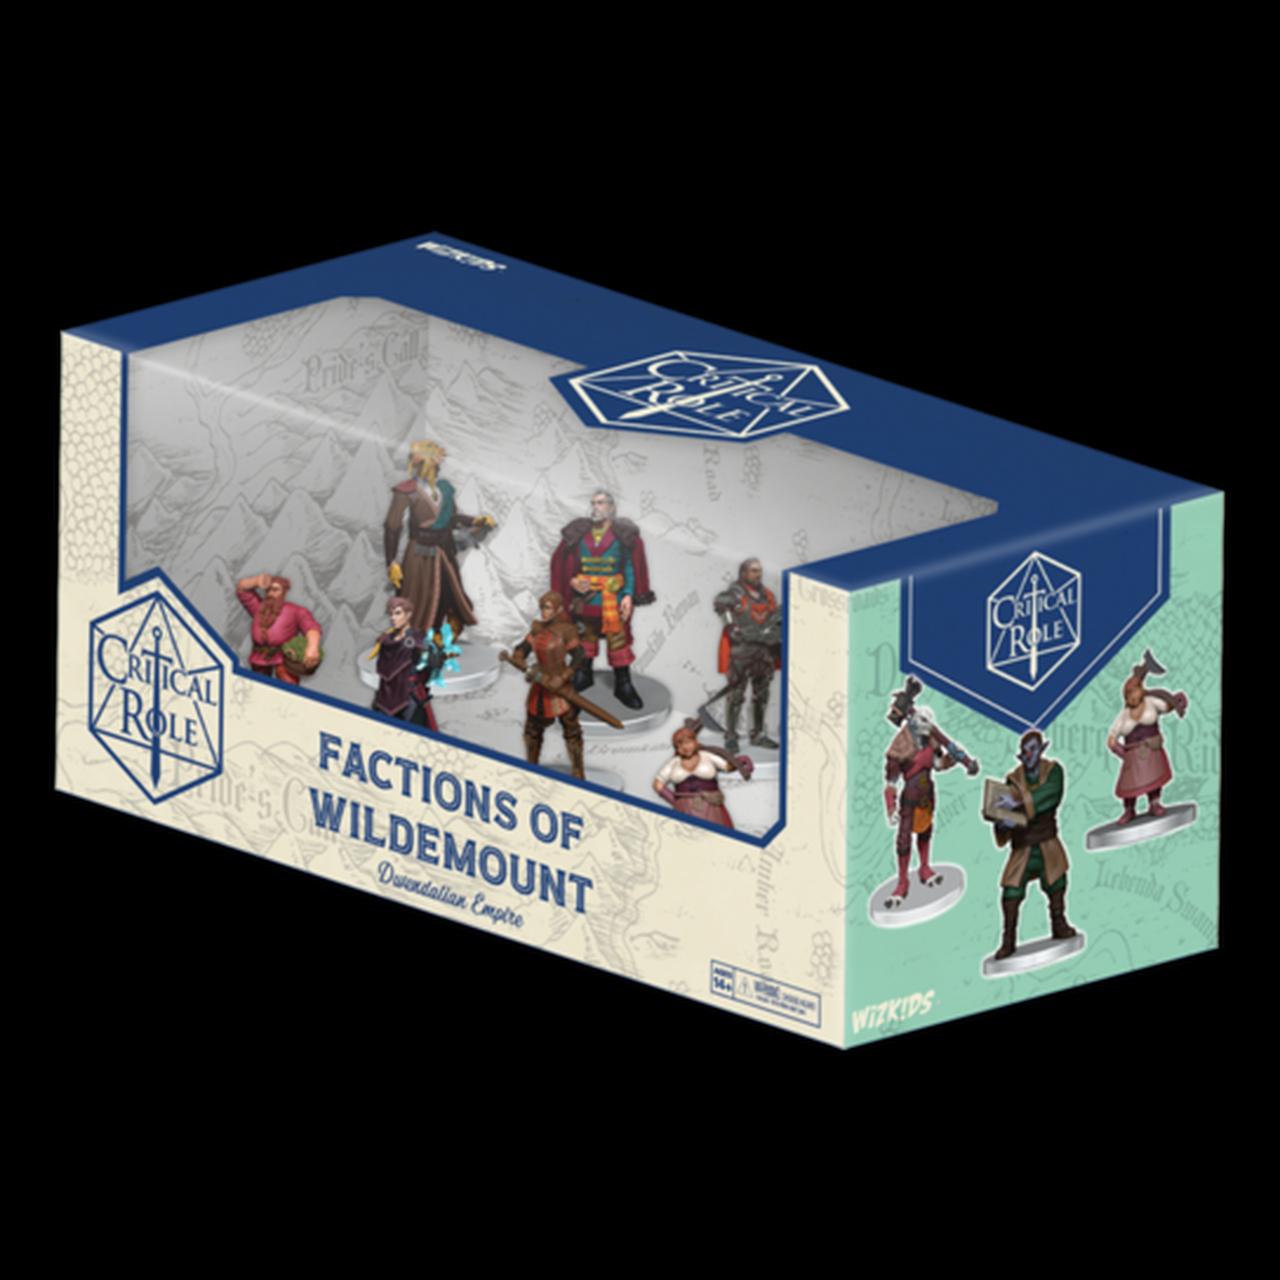 Critical Role: Factions of Wildemount - Dwendalian Empire Box Set